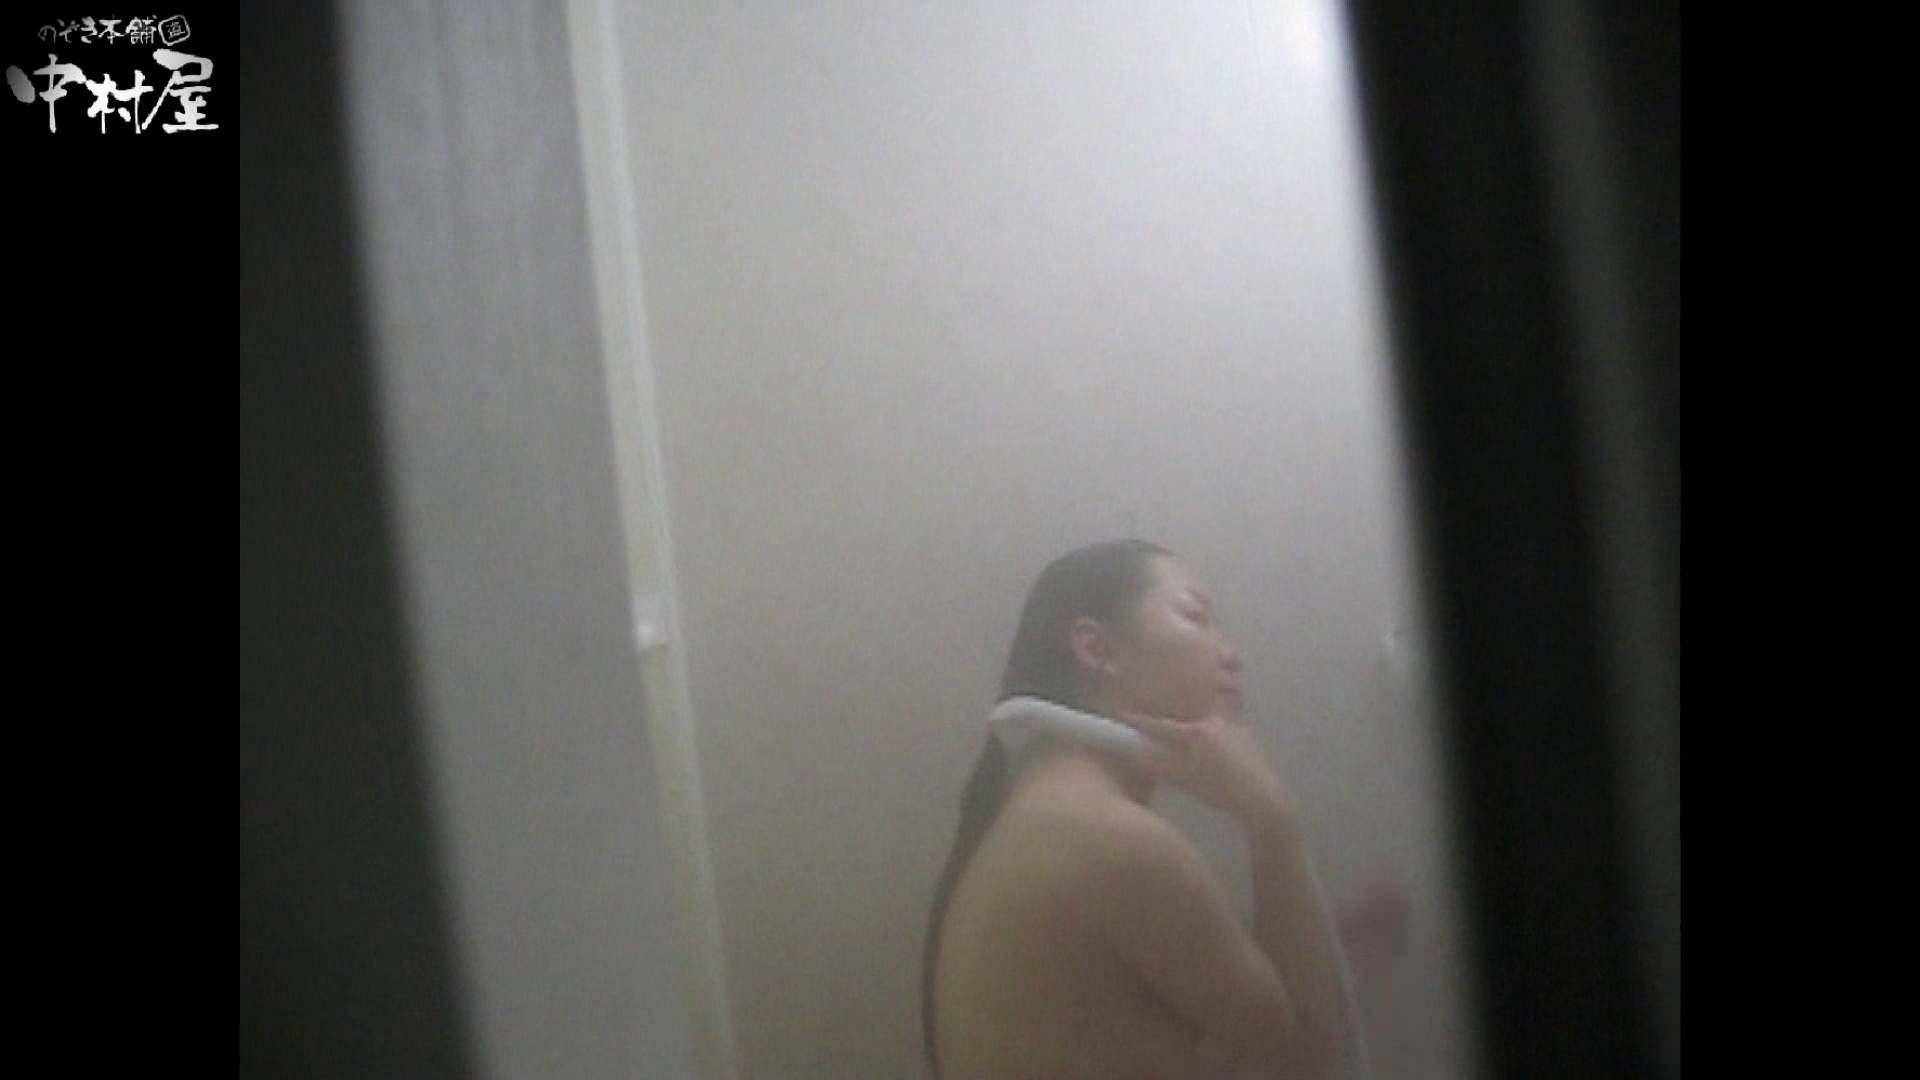 民家風呂専門盗撮師の超危険映像 vol.012 美少女のエロ生活  73連発 36